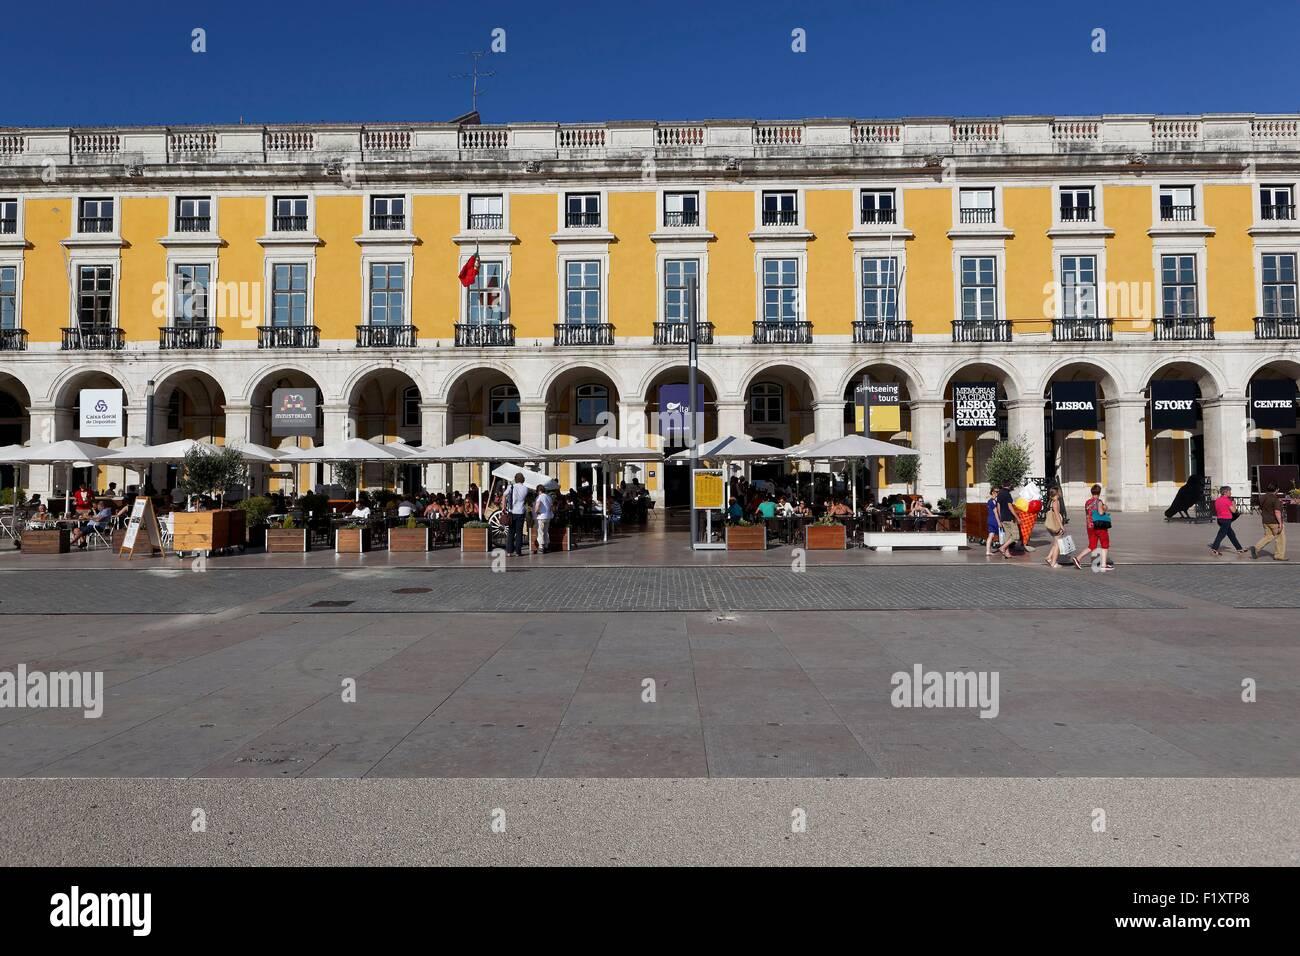 Portugal, Lisbon, Baixa, Praτa do Comercio - Stock Image